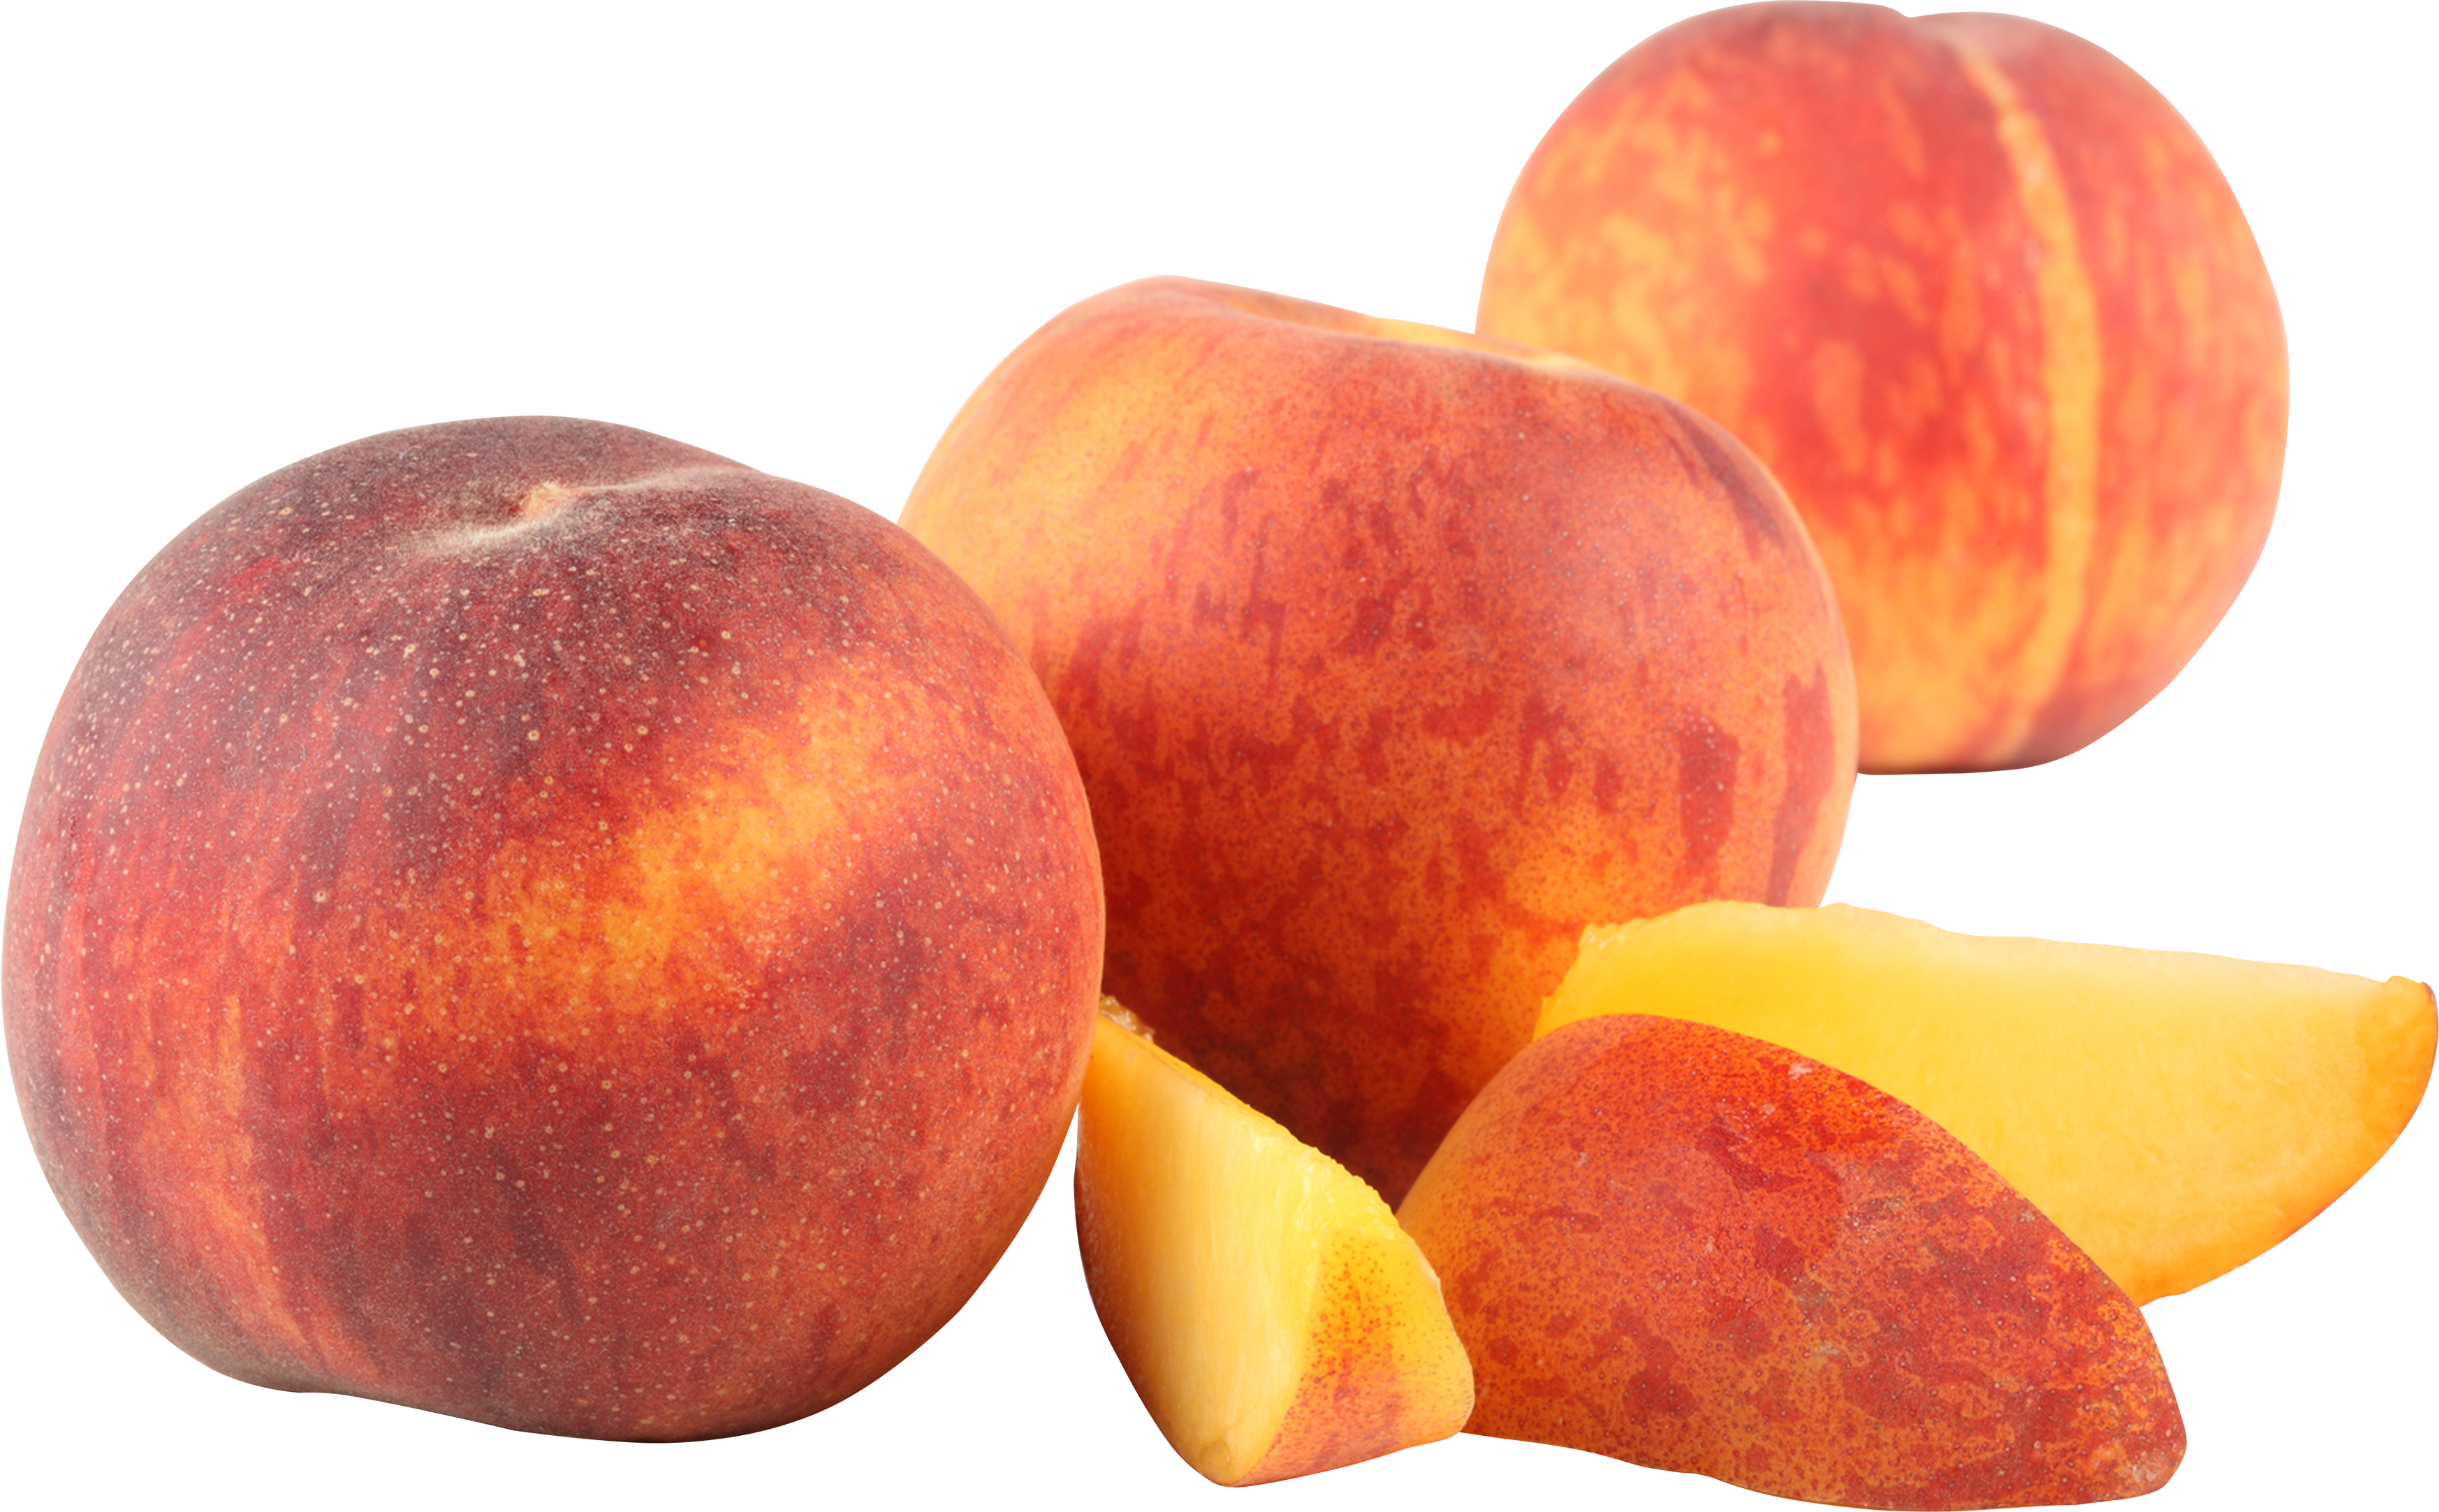 Peach HD PNG - 91151